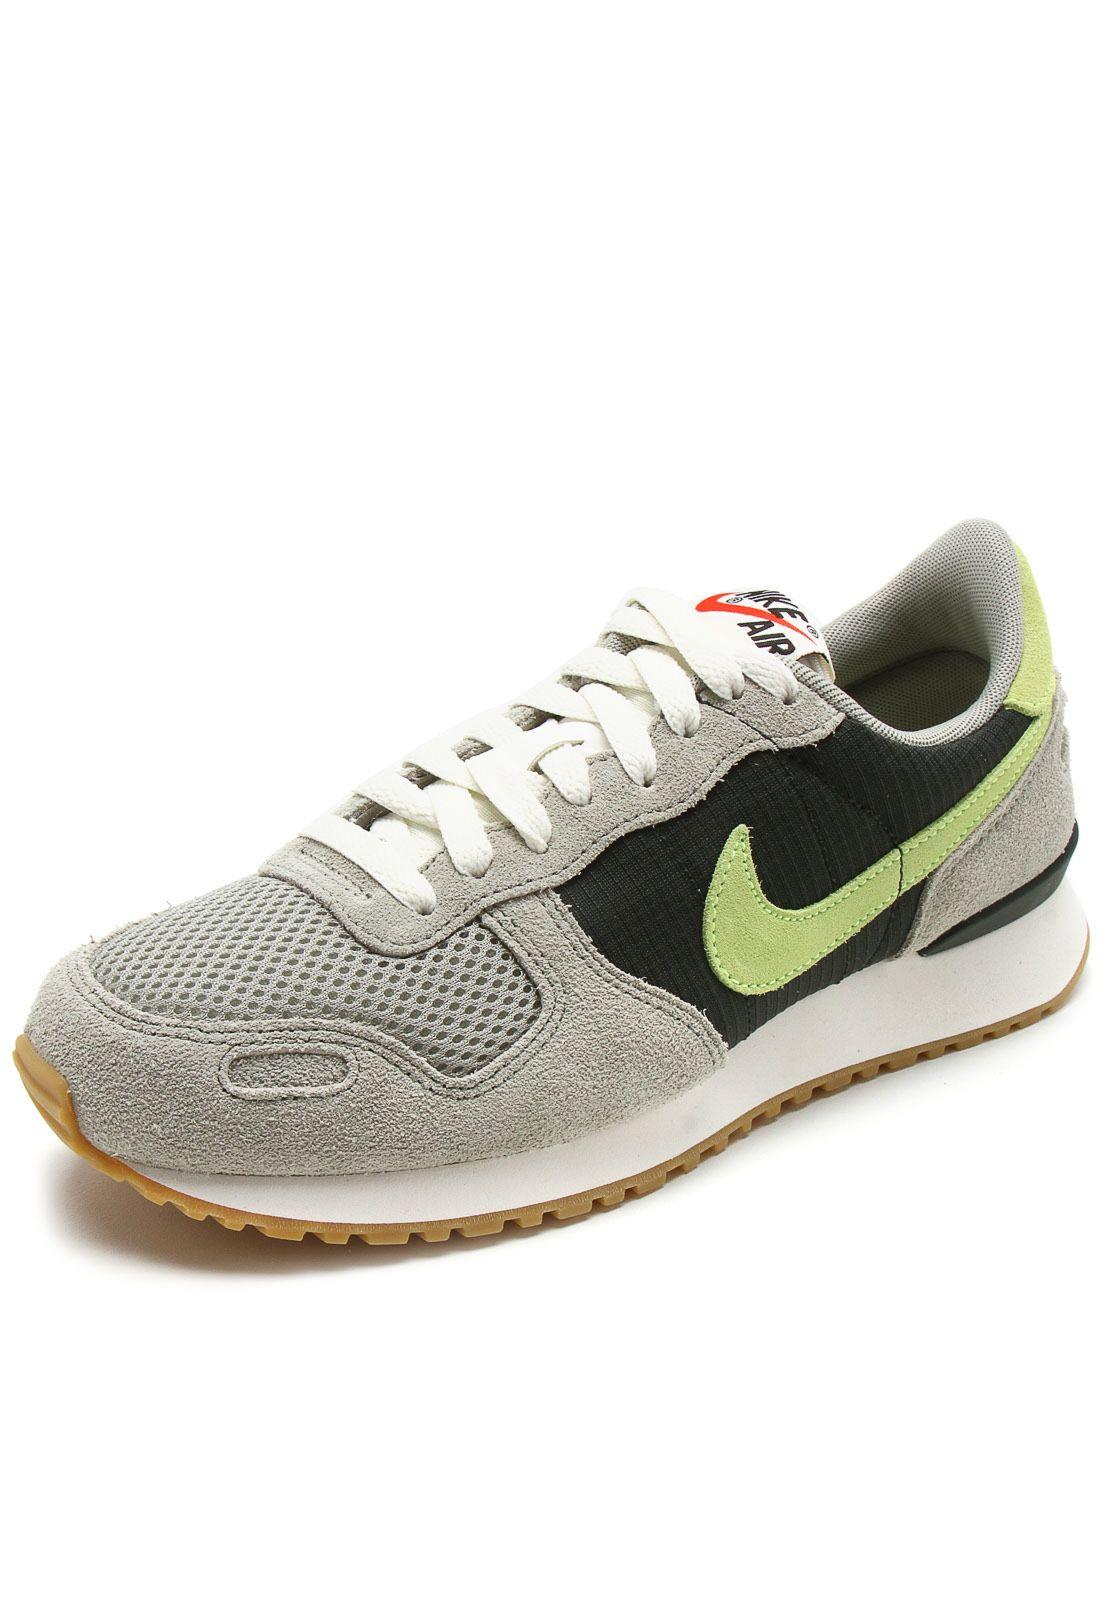 encanto vitamina Tercero  Tênis Nike Sportswear Air Vrtx Verde   Roupas esportivas nike, Nike  sportswear, Nike